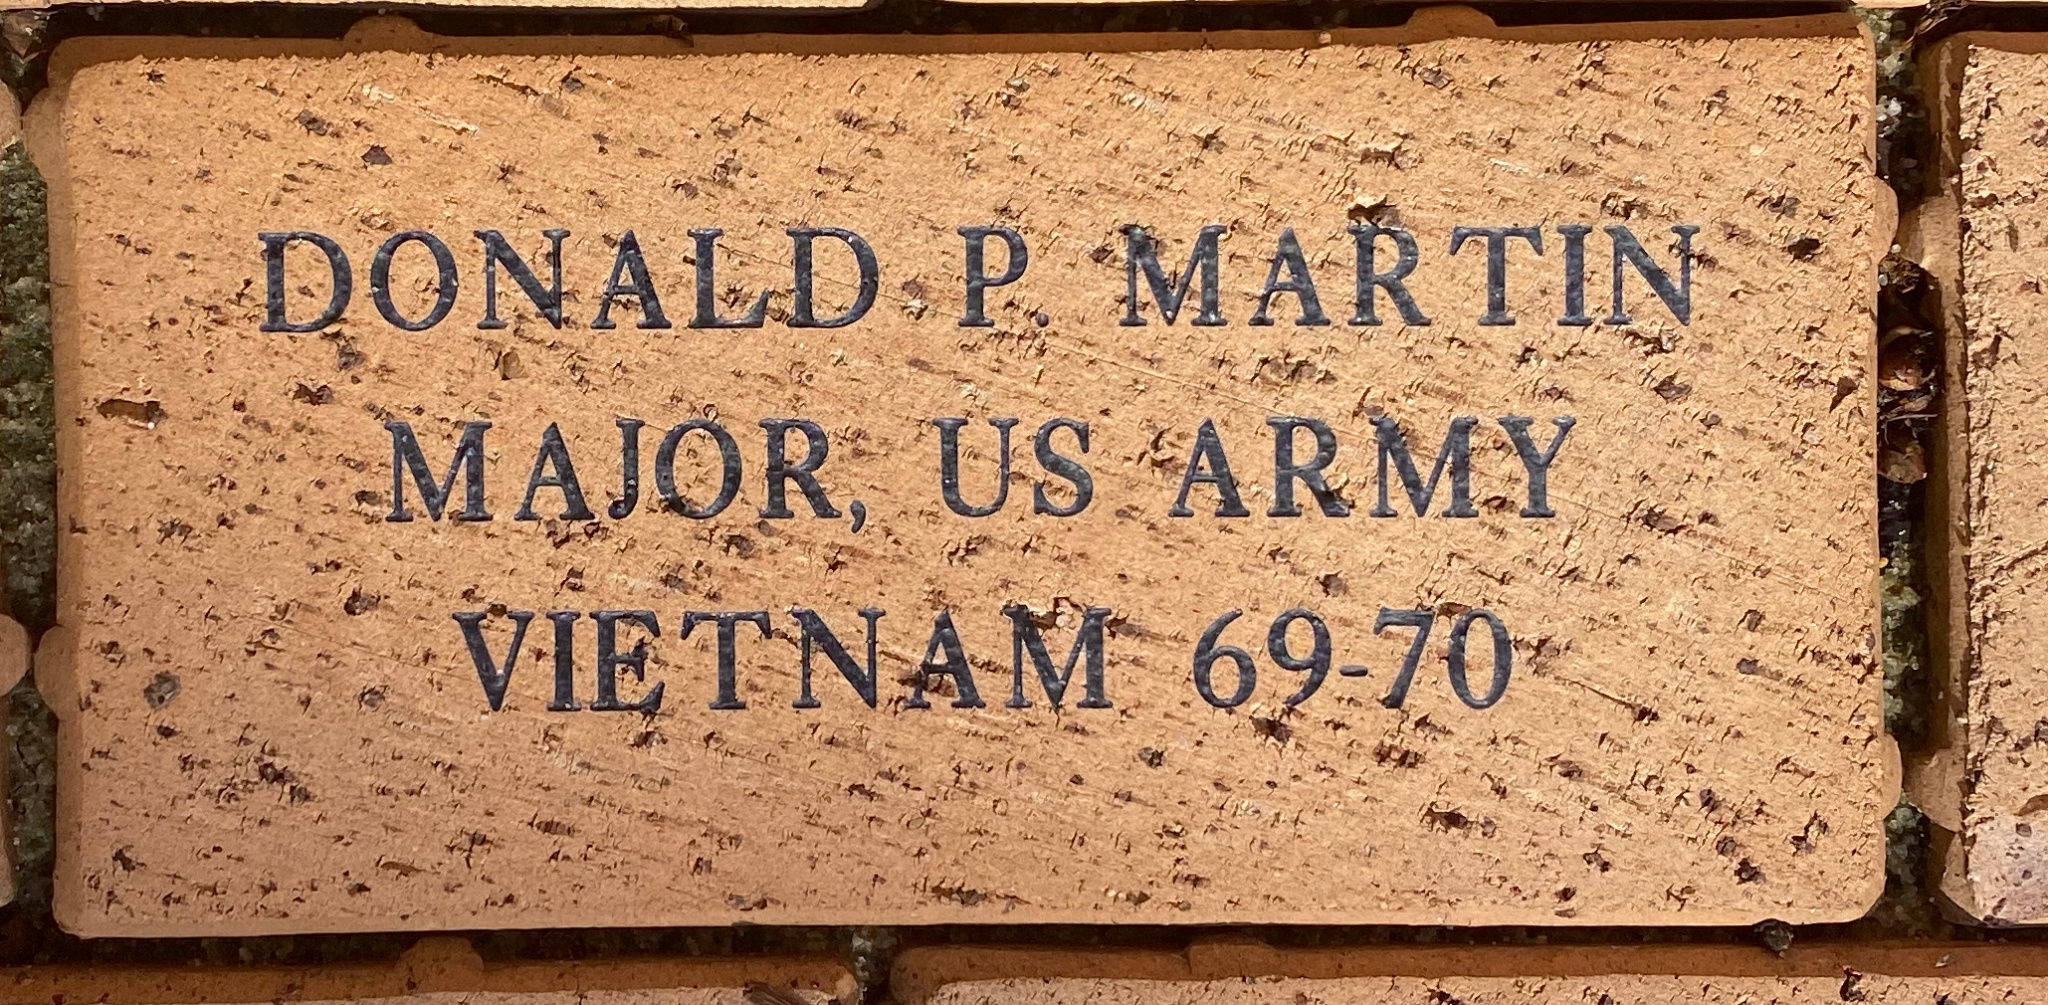 DONALD P. MARTIN MAJOR, US ARMY VIETNAM 69-70